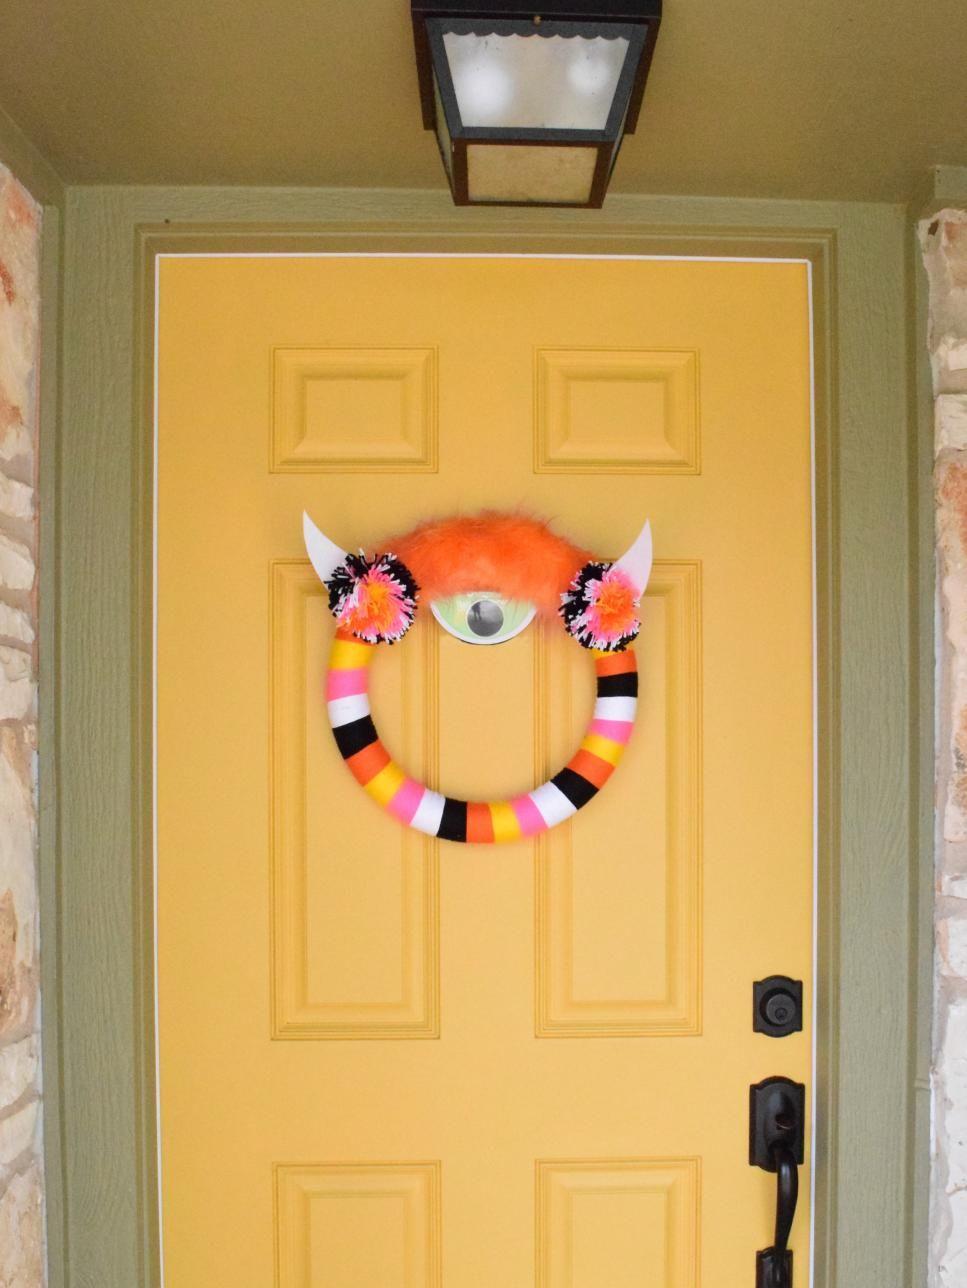 10 Funny and Cute DIY Halloween Wreaths | Monster wreath, DIY ...